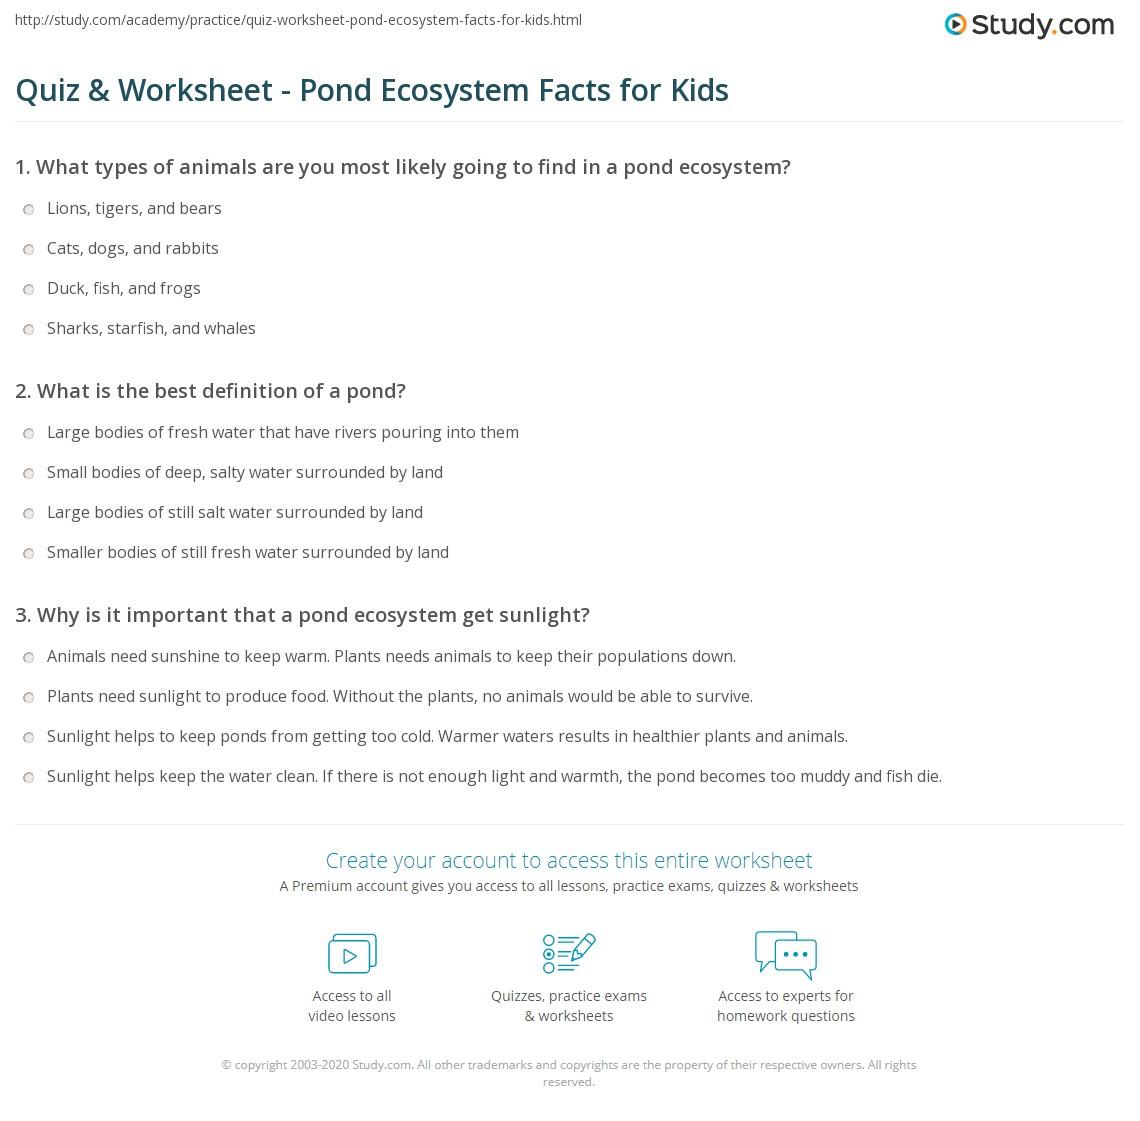 Quiz & Worksheet - Pond Ecosystem Facts for Kids | Study com